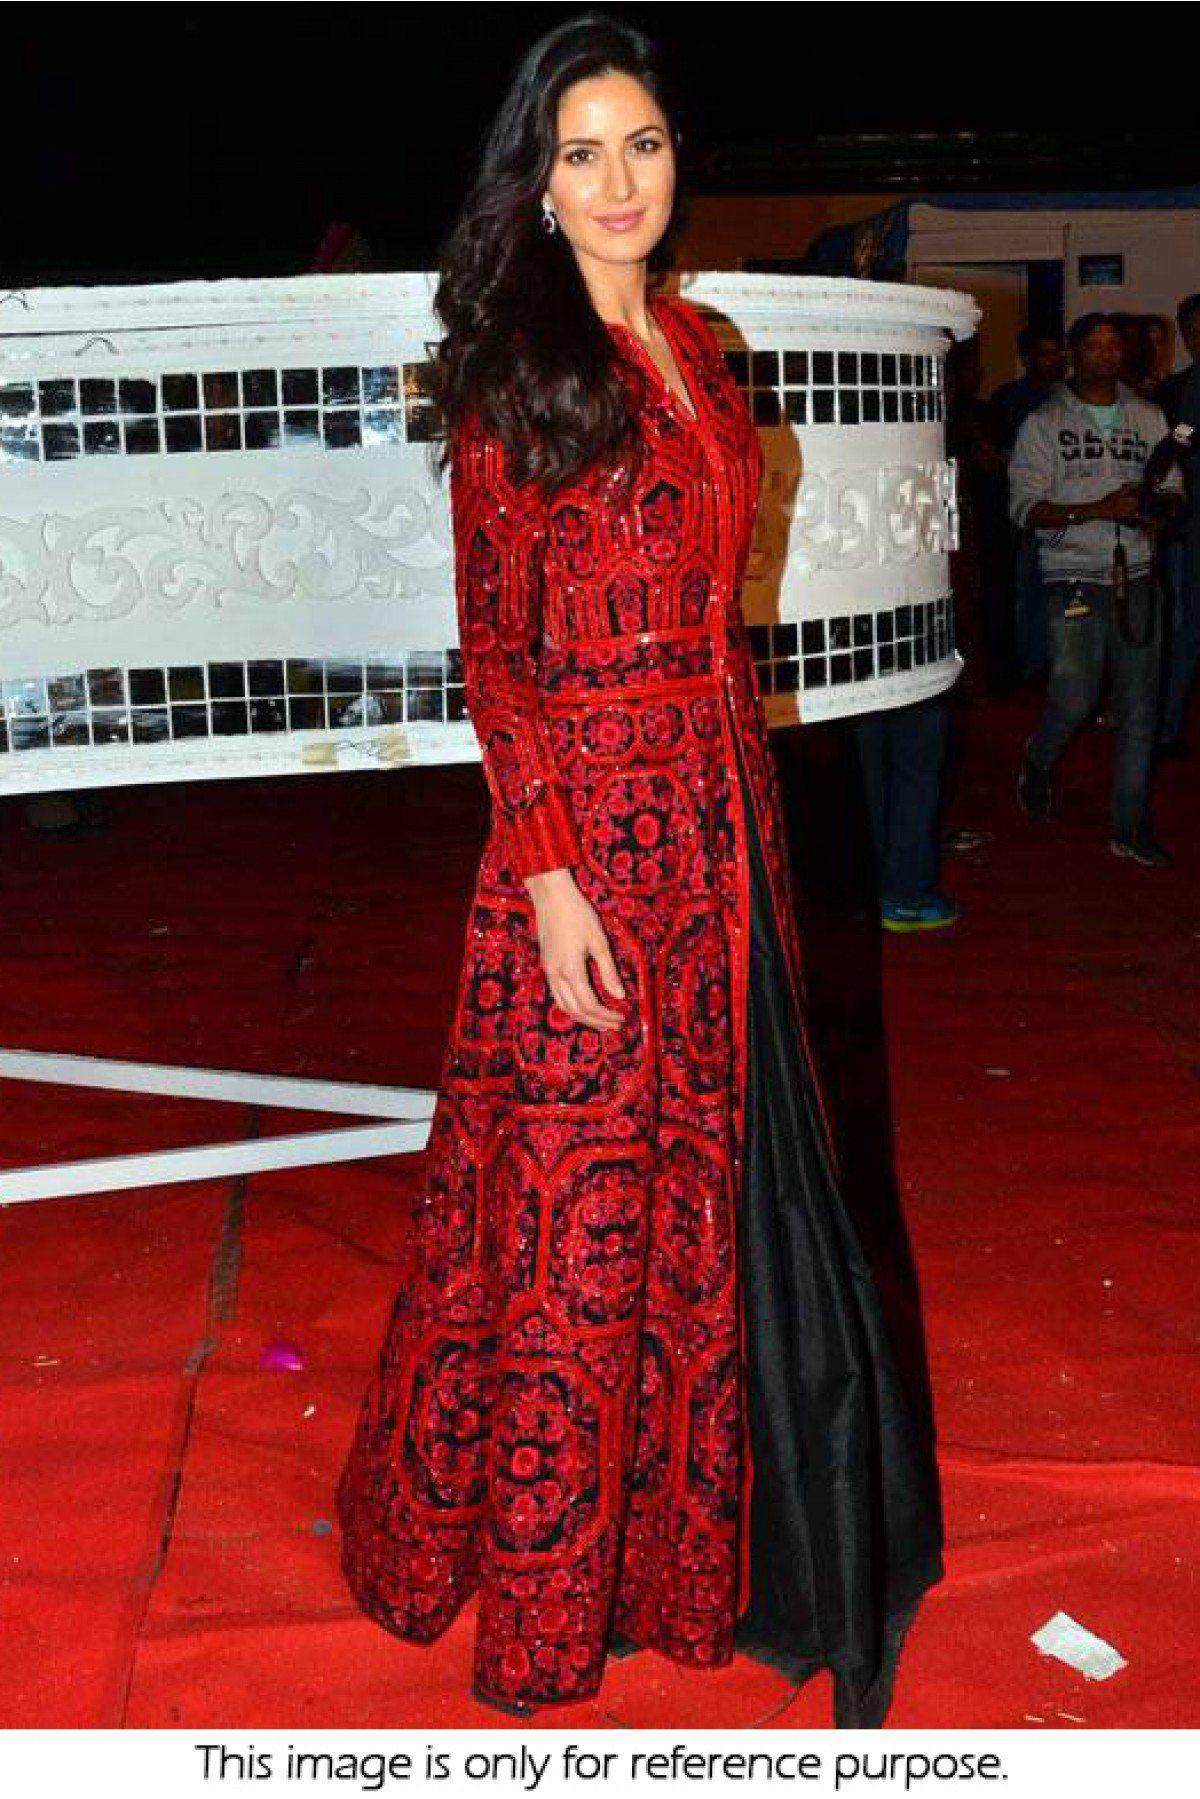 Bollywood Style Katrina Kaif Bhagalpuri Silk Gown In Red And Black Colour Nc3030 Model Pakaian Muslim Model Baju Wanita Pakaian Pakistan